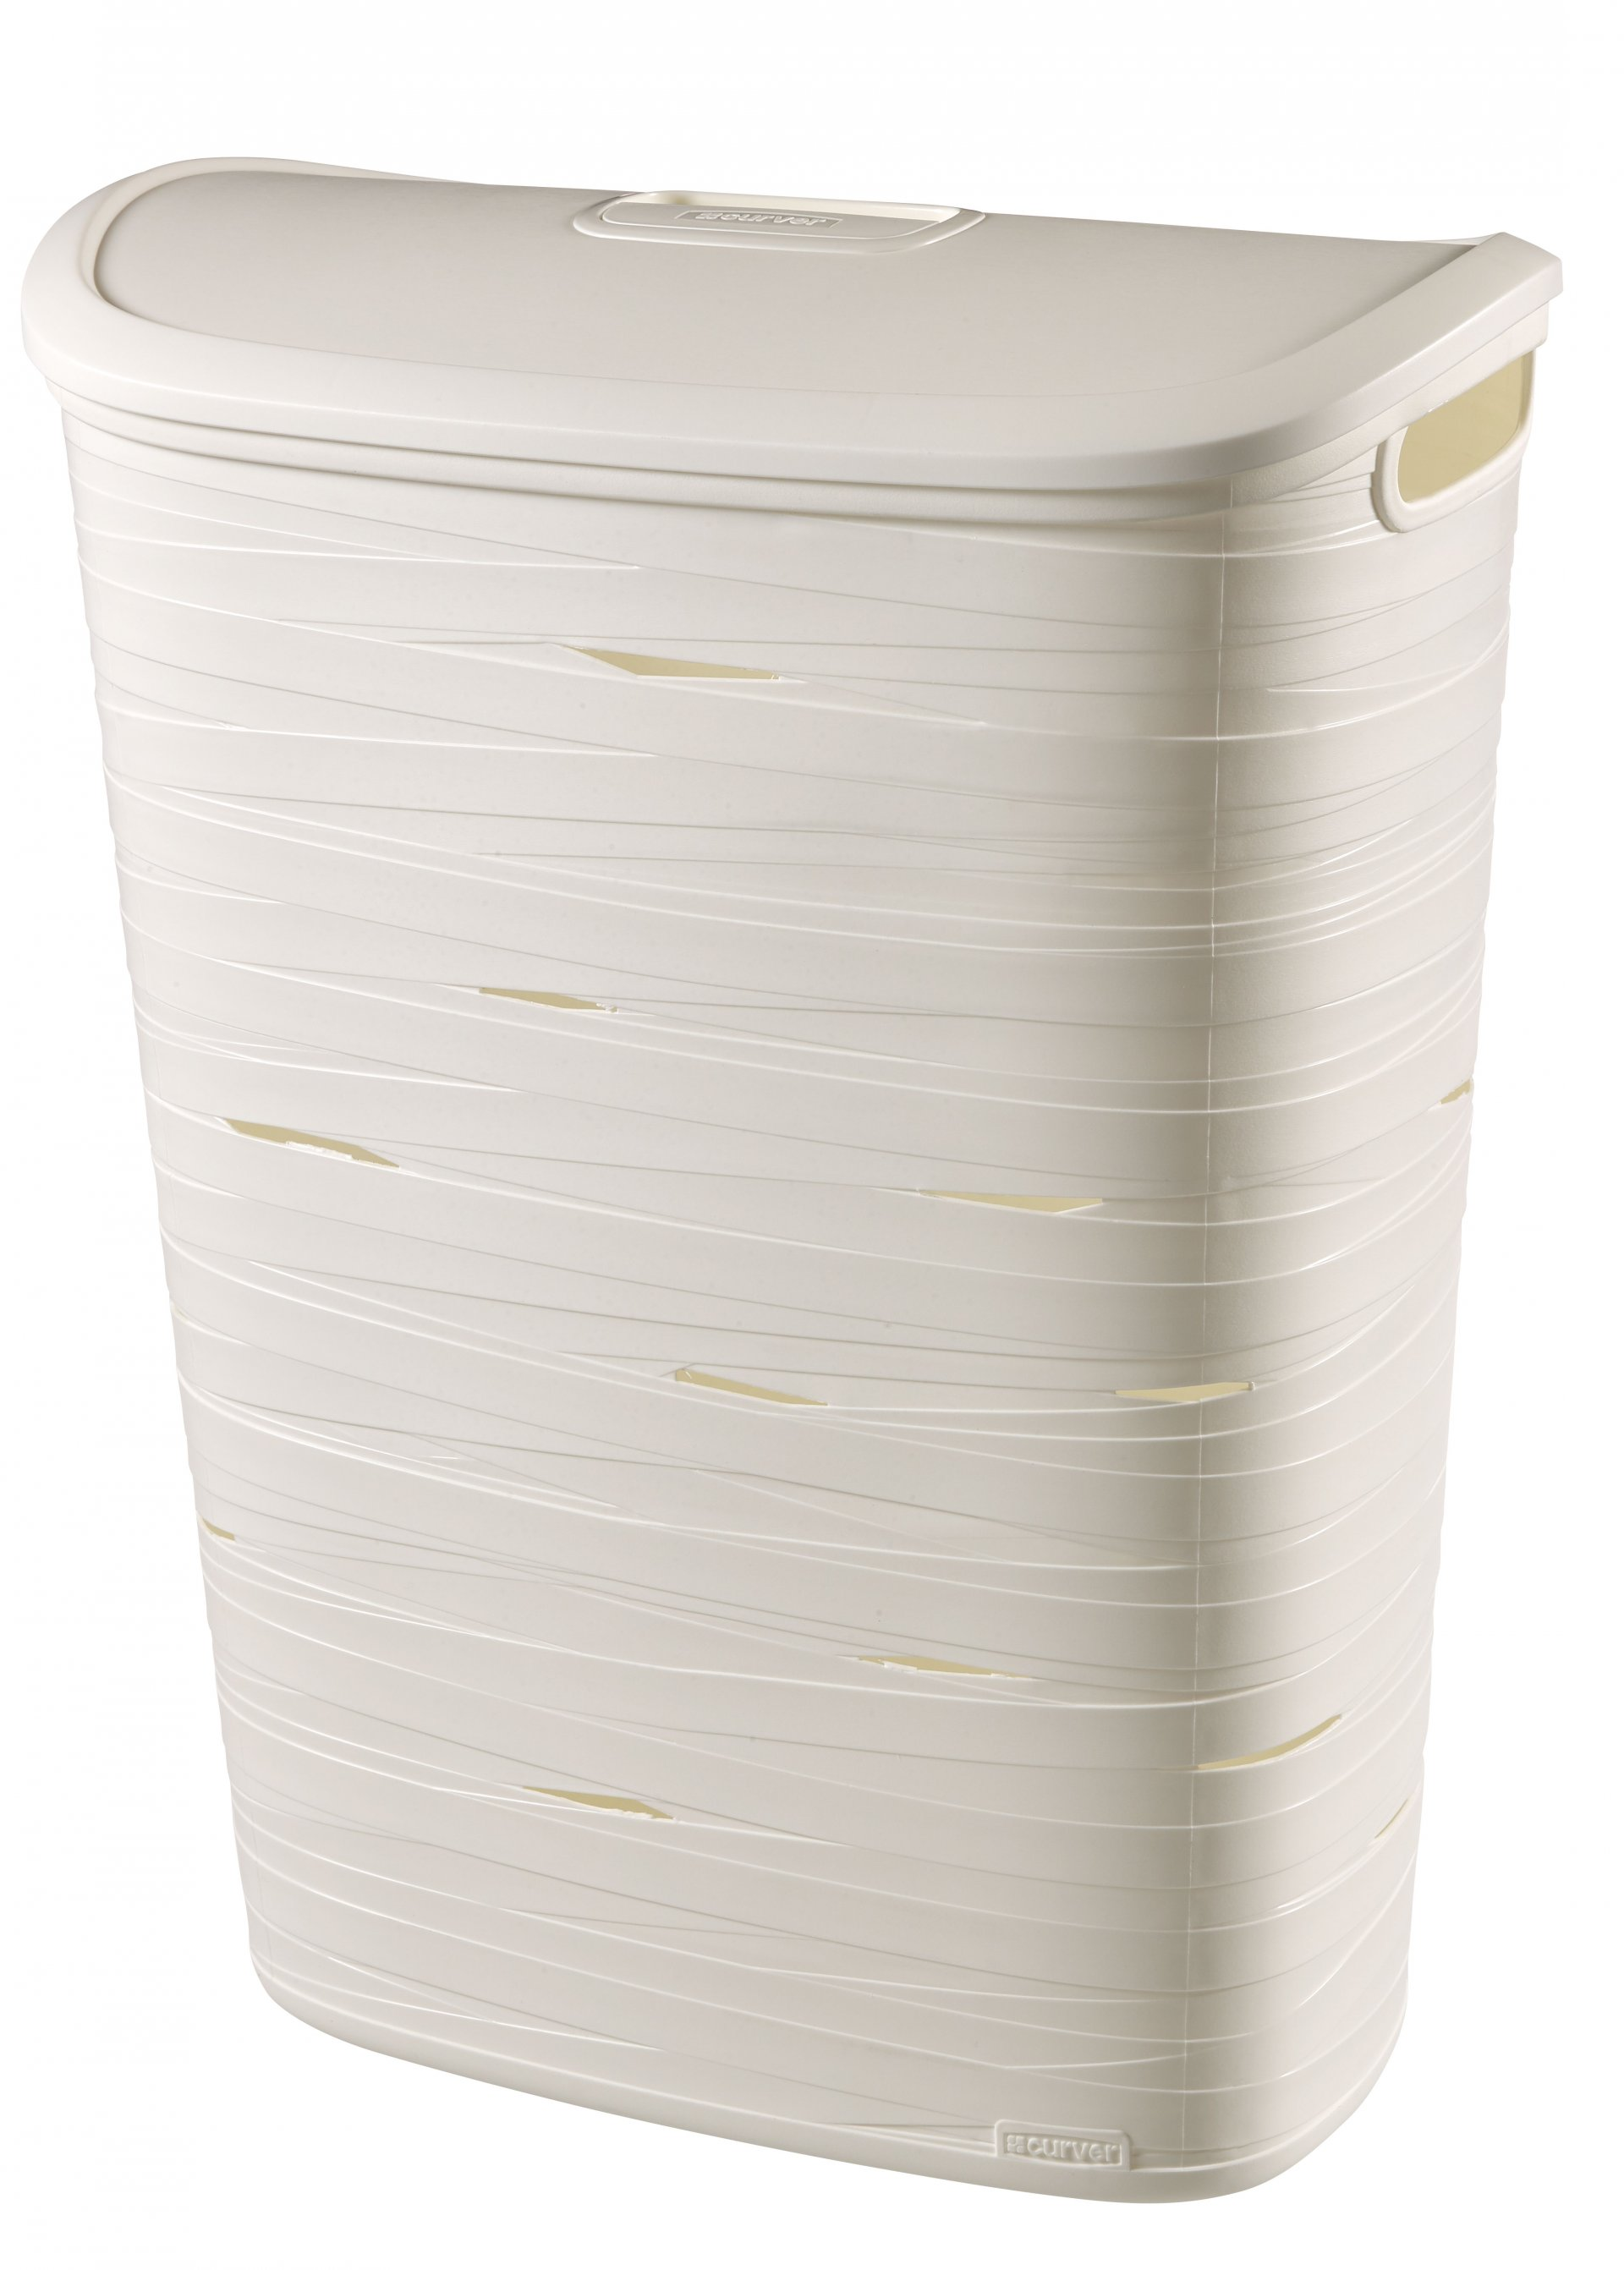 Curver Koš na špinavé prádlo RIBBON 49l bílý